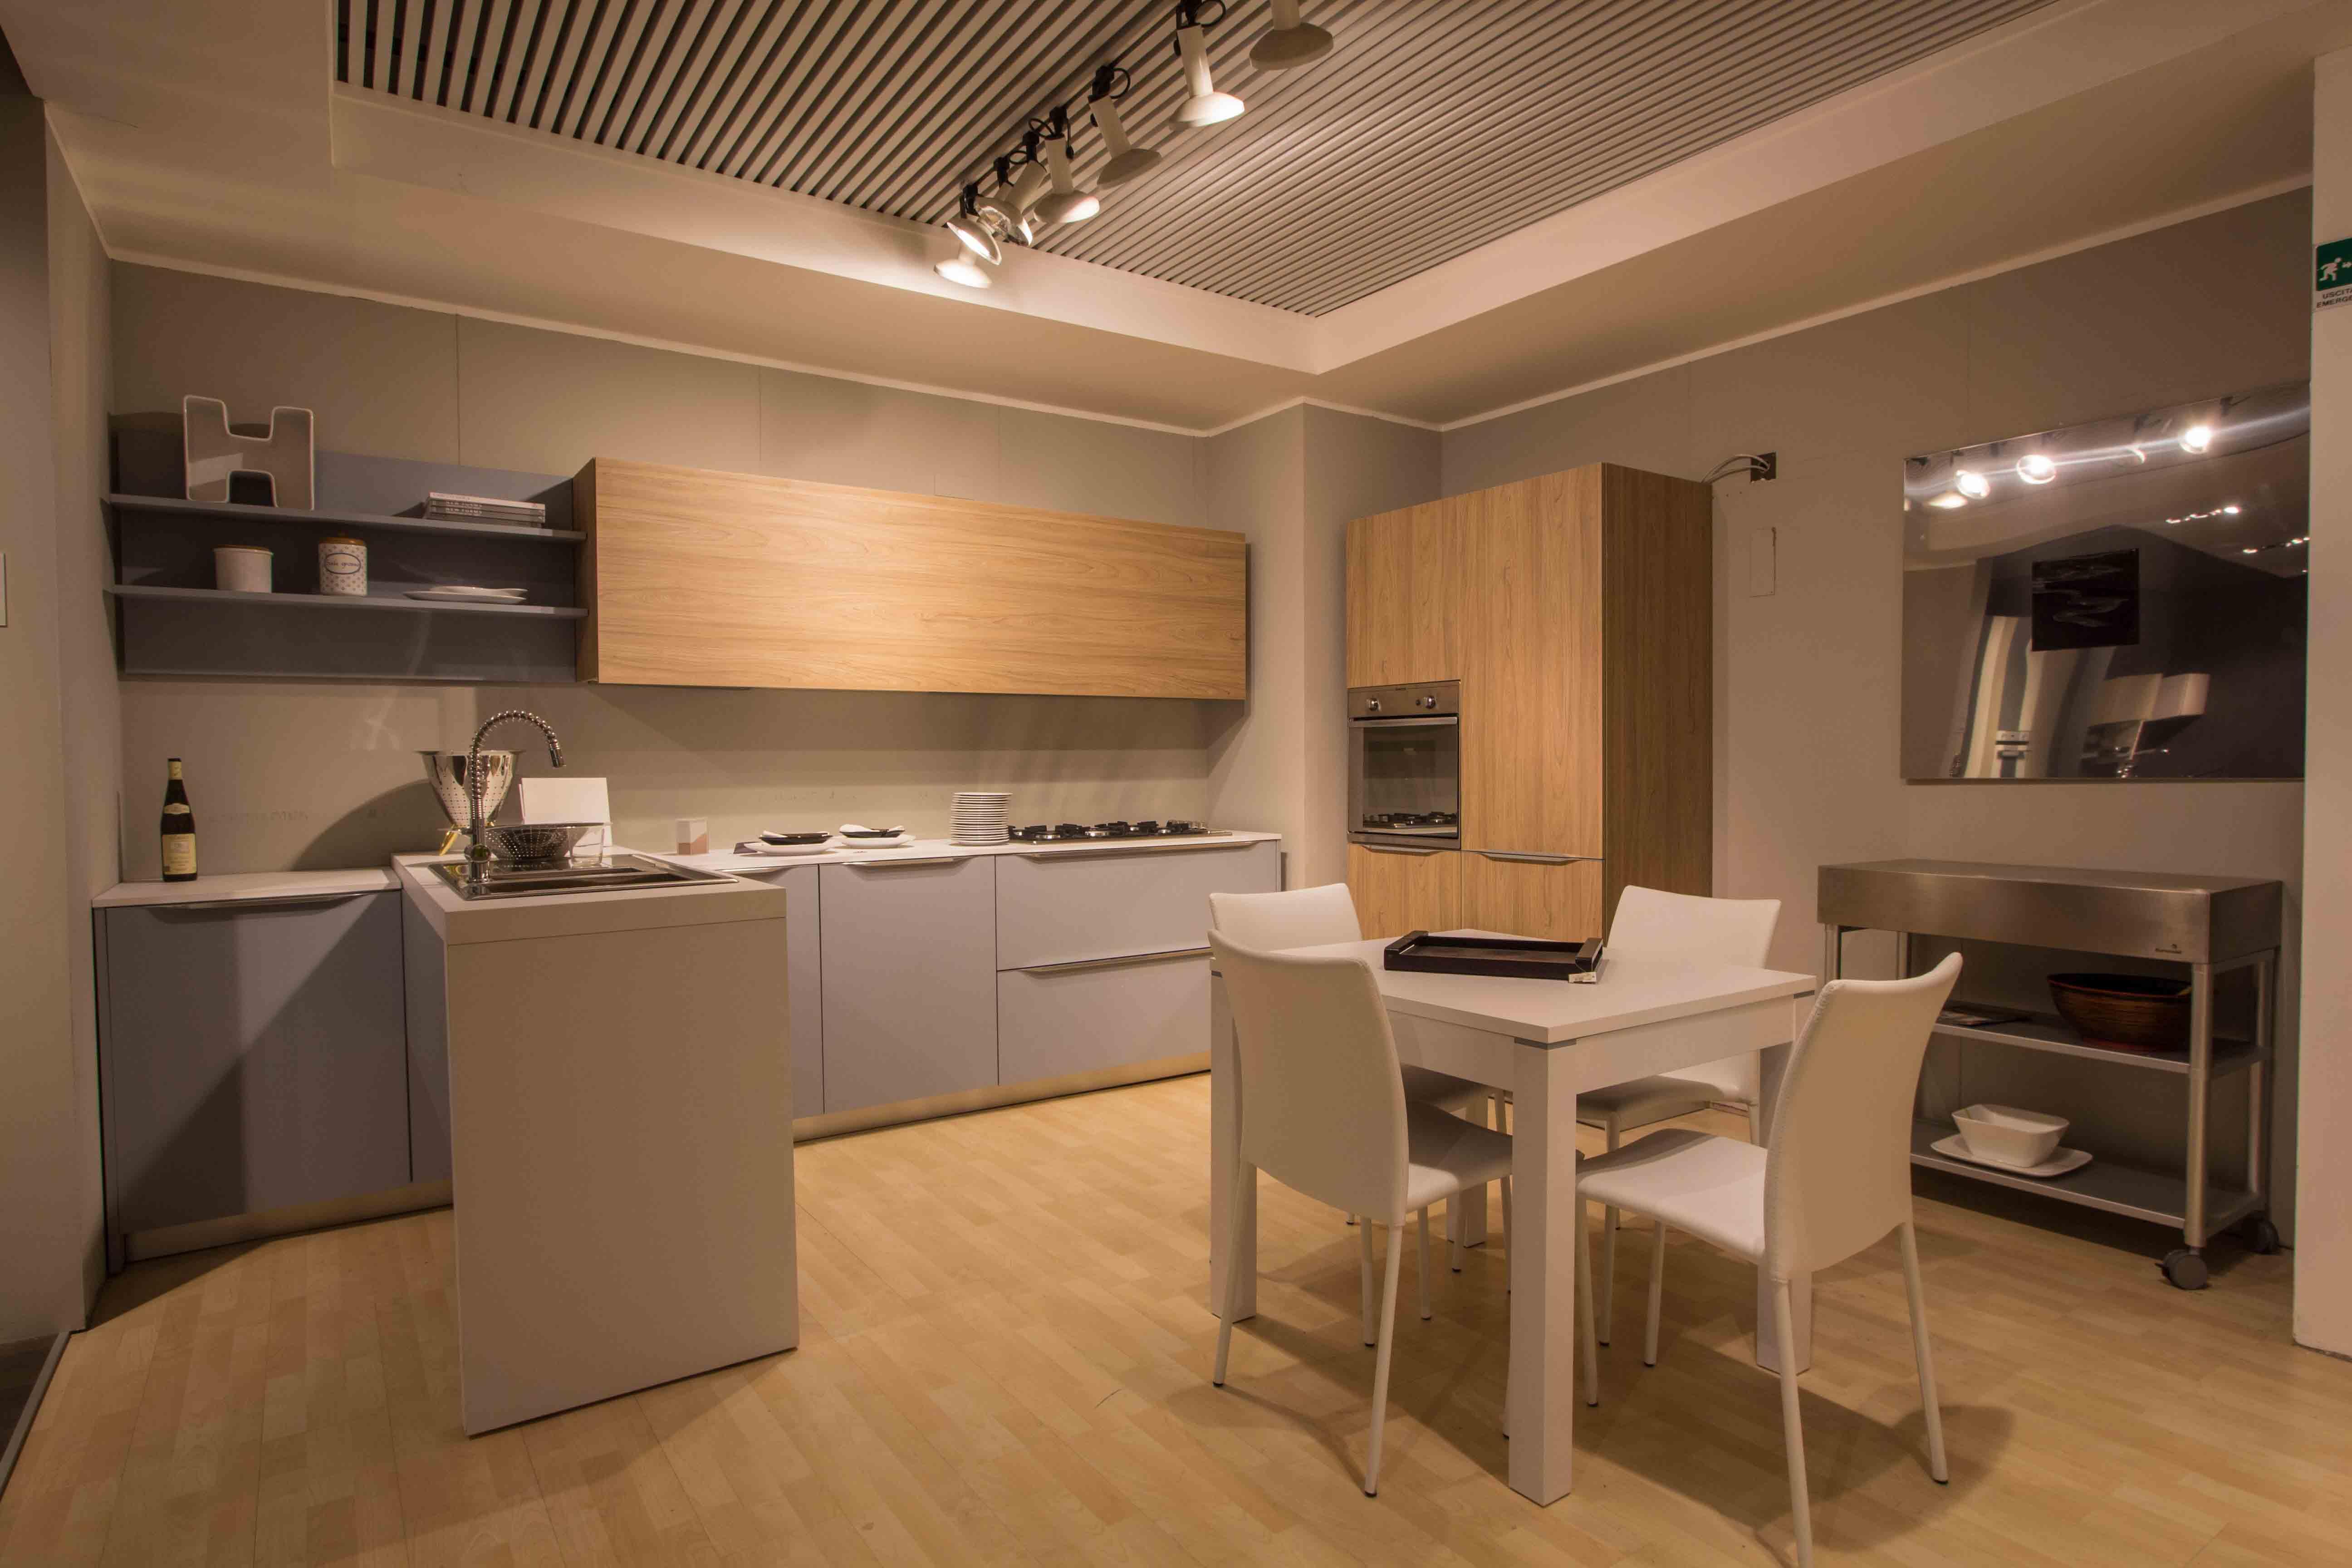 Cucina DEL TONGO - Modello Valencia